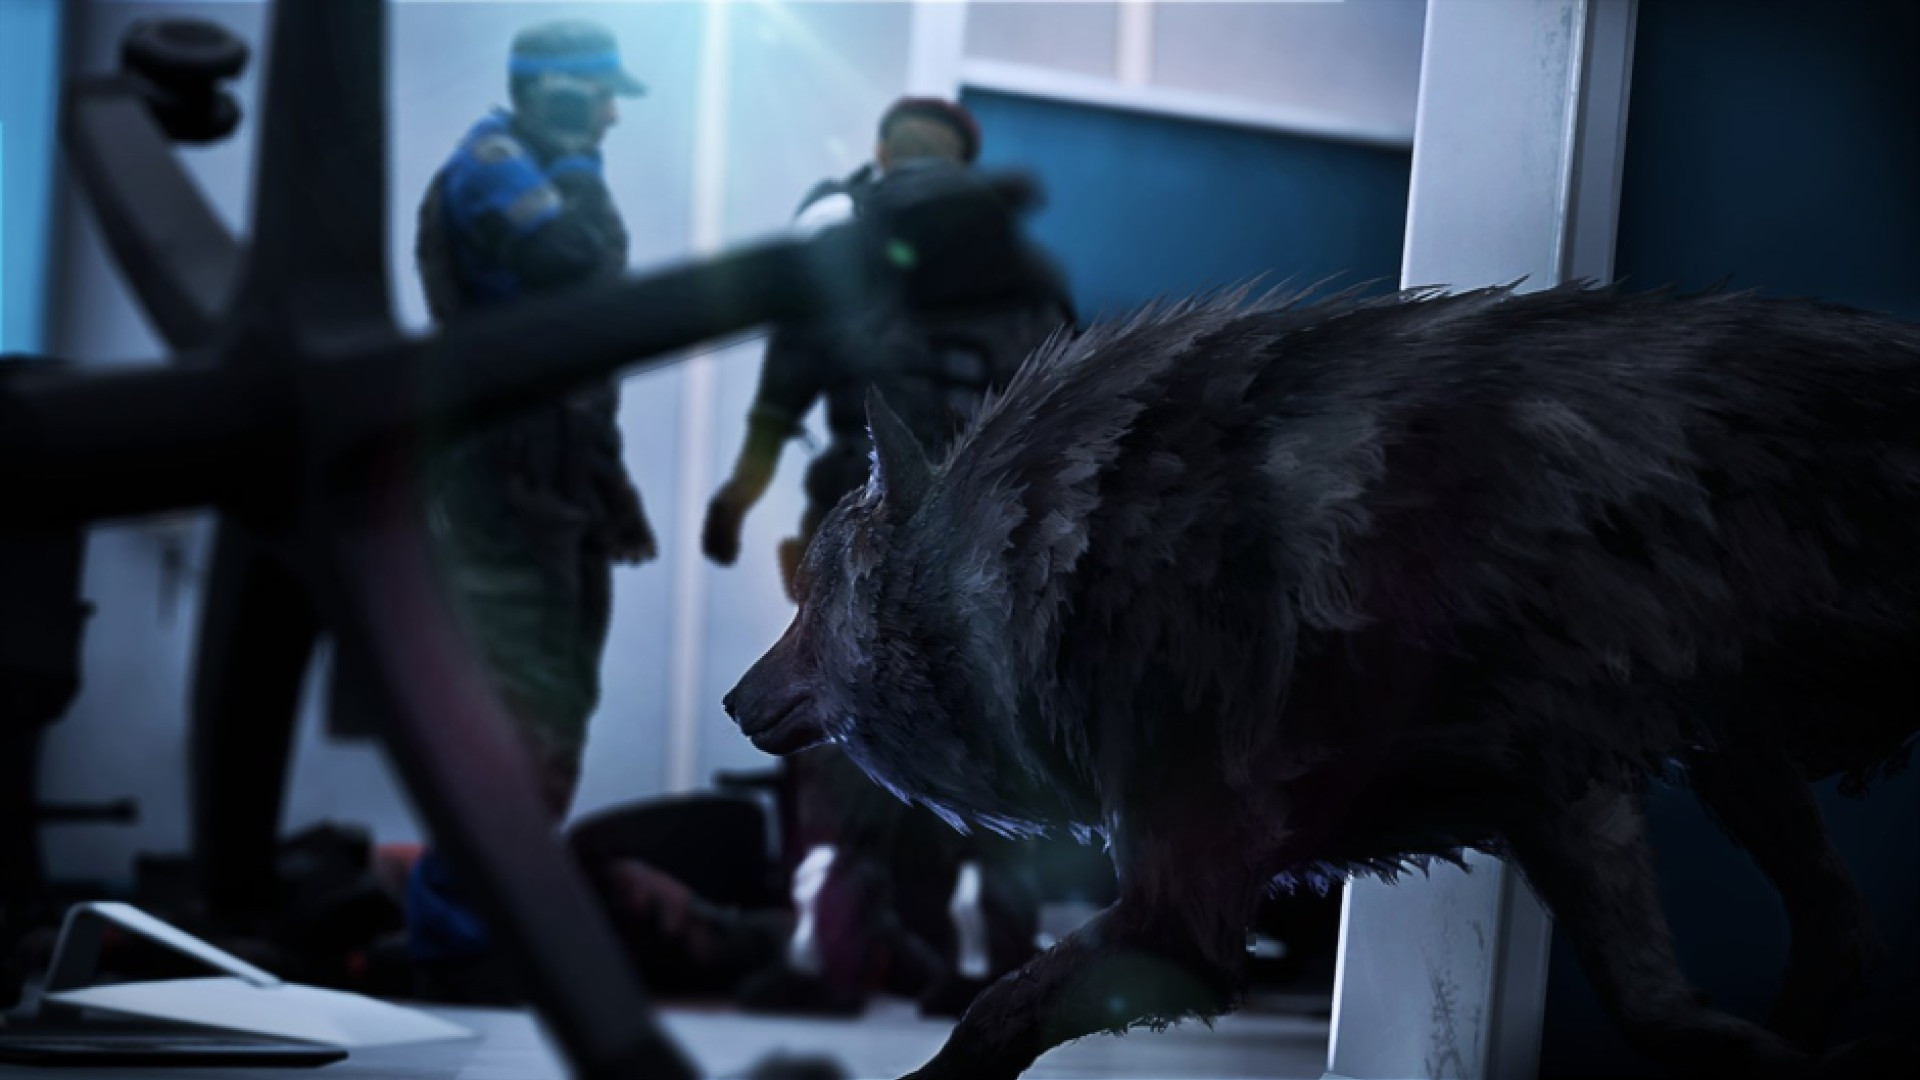 Werewolf: The Apocalypse - Earthblood - February 4 - Optimized for Xbox Series X |  S